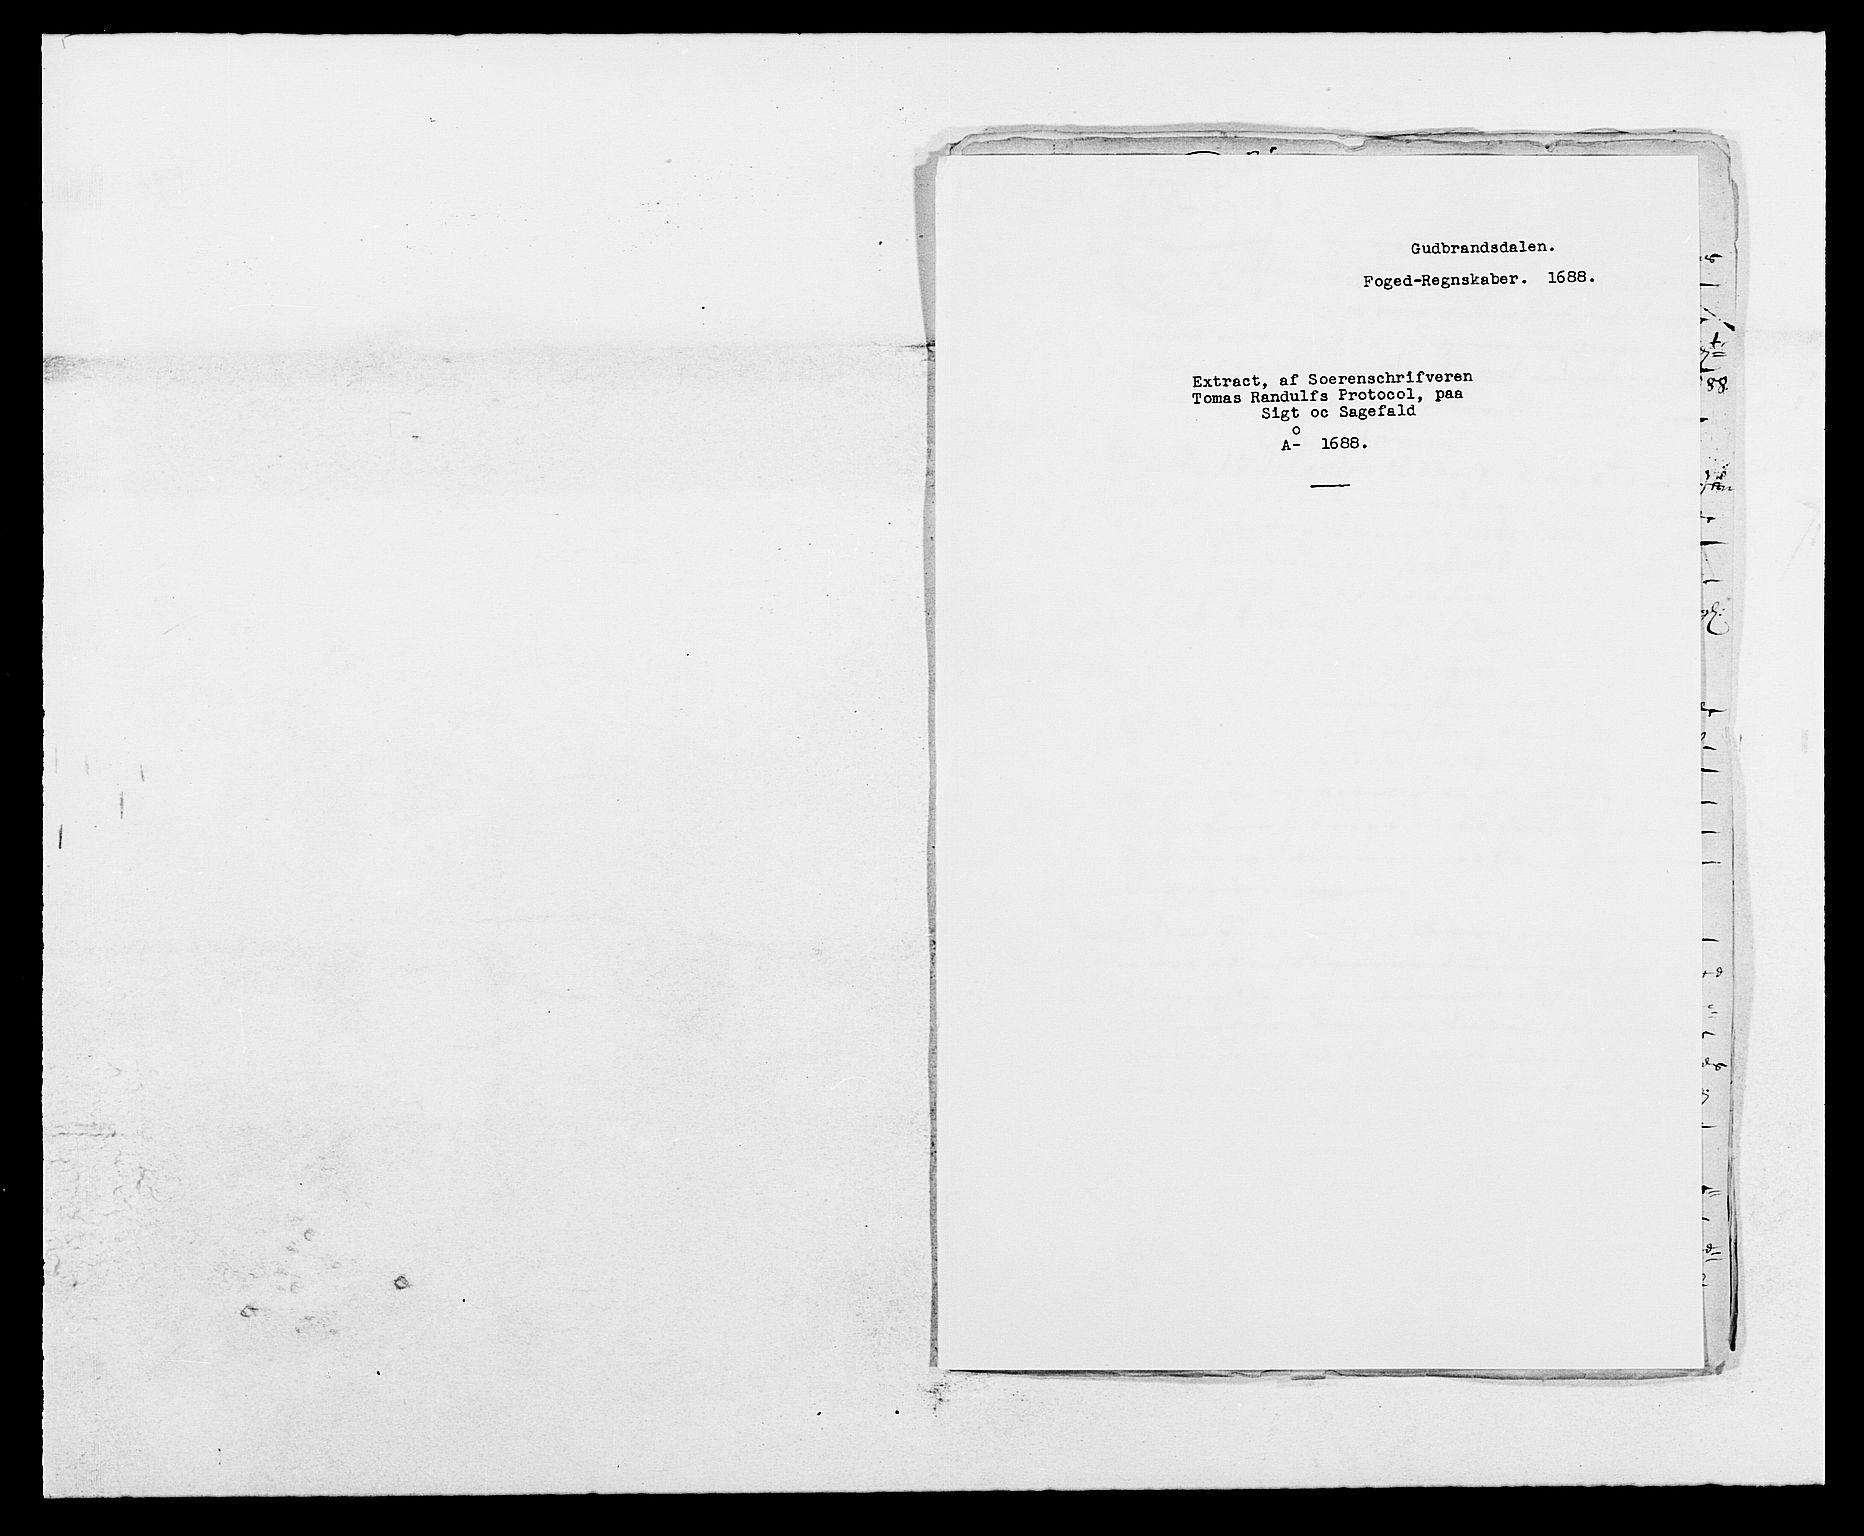 RA, Rentekammeret inntil 1814, Reviderte regnskaper, Fogderegnskap, R17/L1163: Fogderegnskap Gudbrandsdal, 1682-1689, s. 312